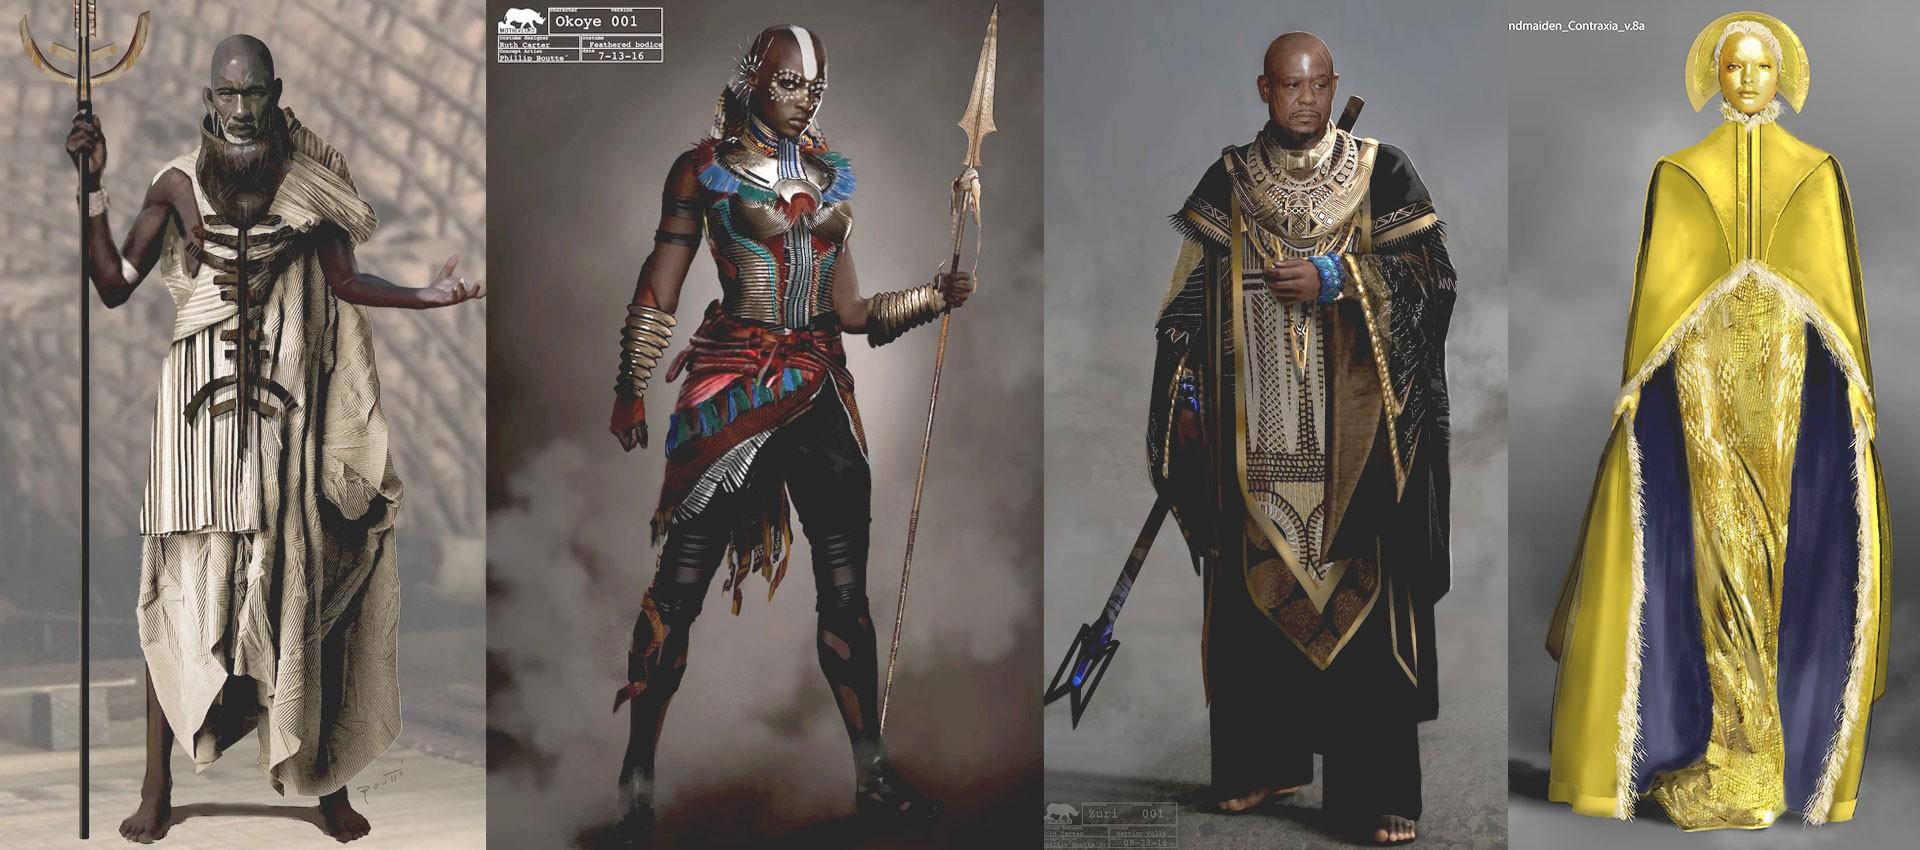 costume design.jpeg